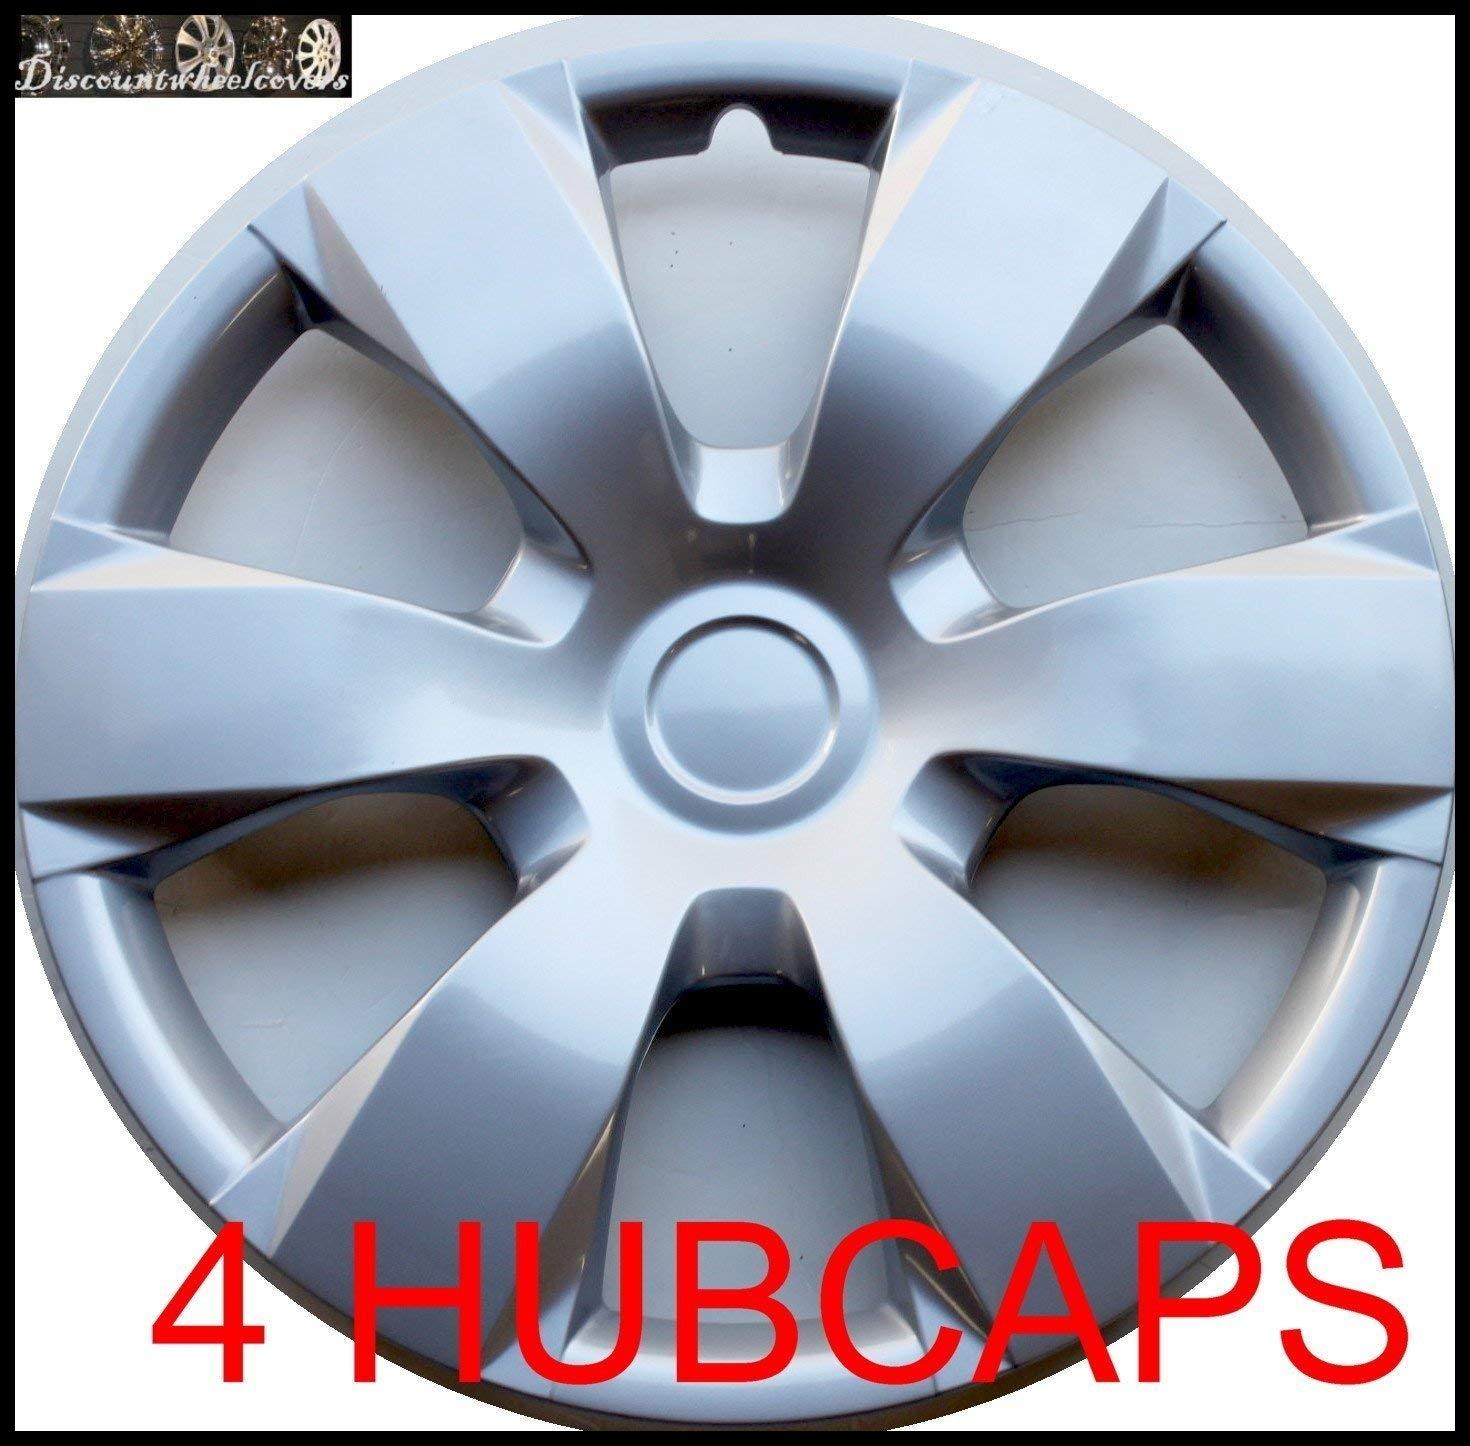 "Amazon 16"" SET OF 4 HUBCAPS TOYOTA CAMRY MATRIX WHEEL COVERS DESIGN ARE UNIVERSAL HU Automotive"